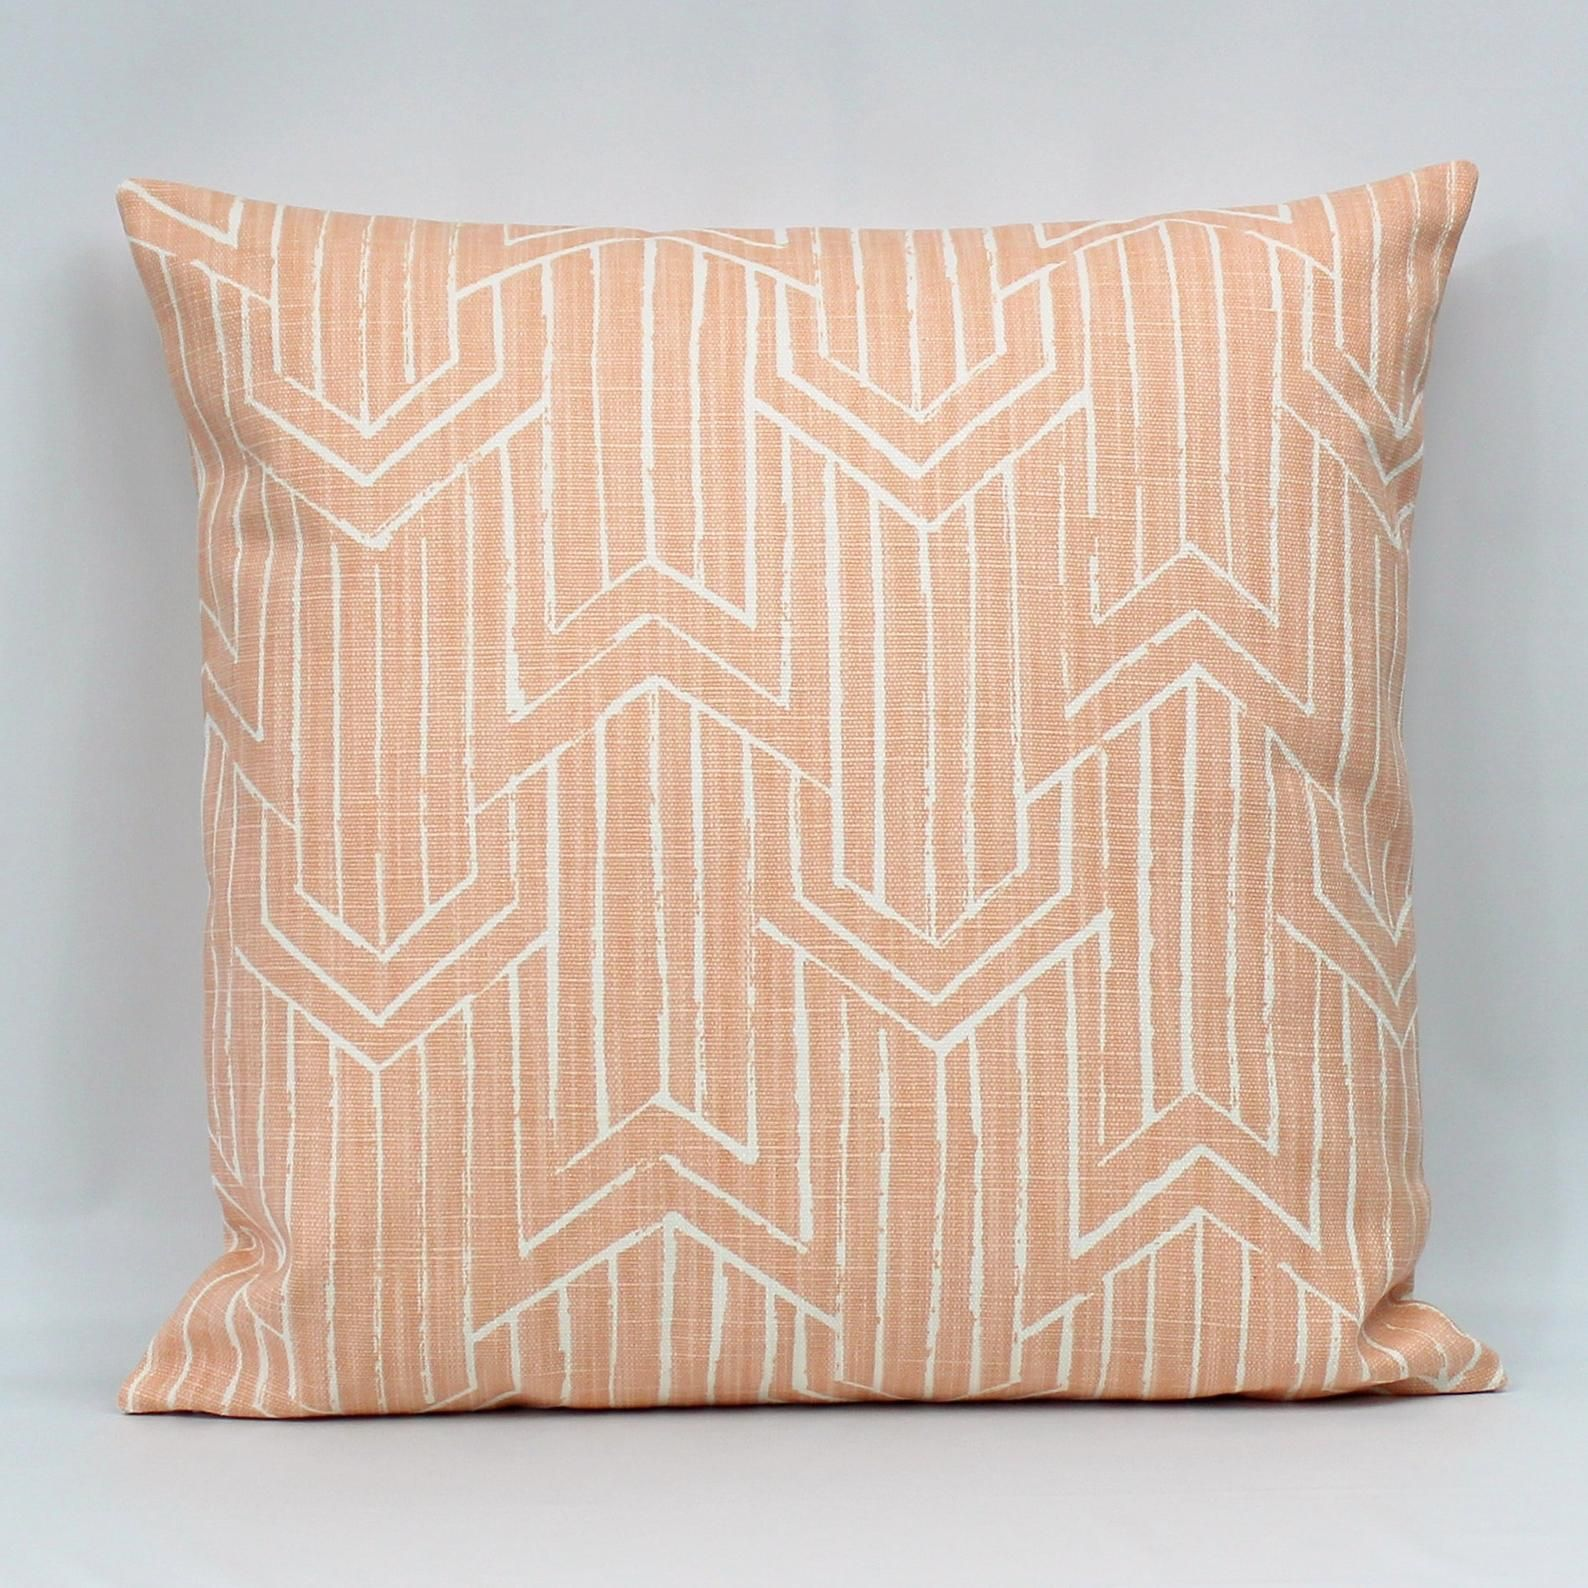 Coral Throw Pillow Cover Peach Throw Pillow Cover Coral Etsy Coral Throw Pillows Peach Pillow Throw Pillows